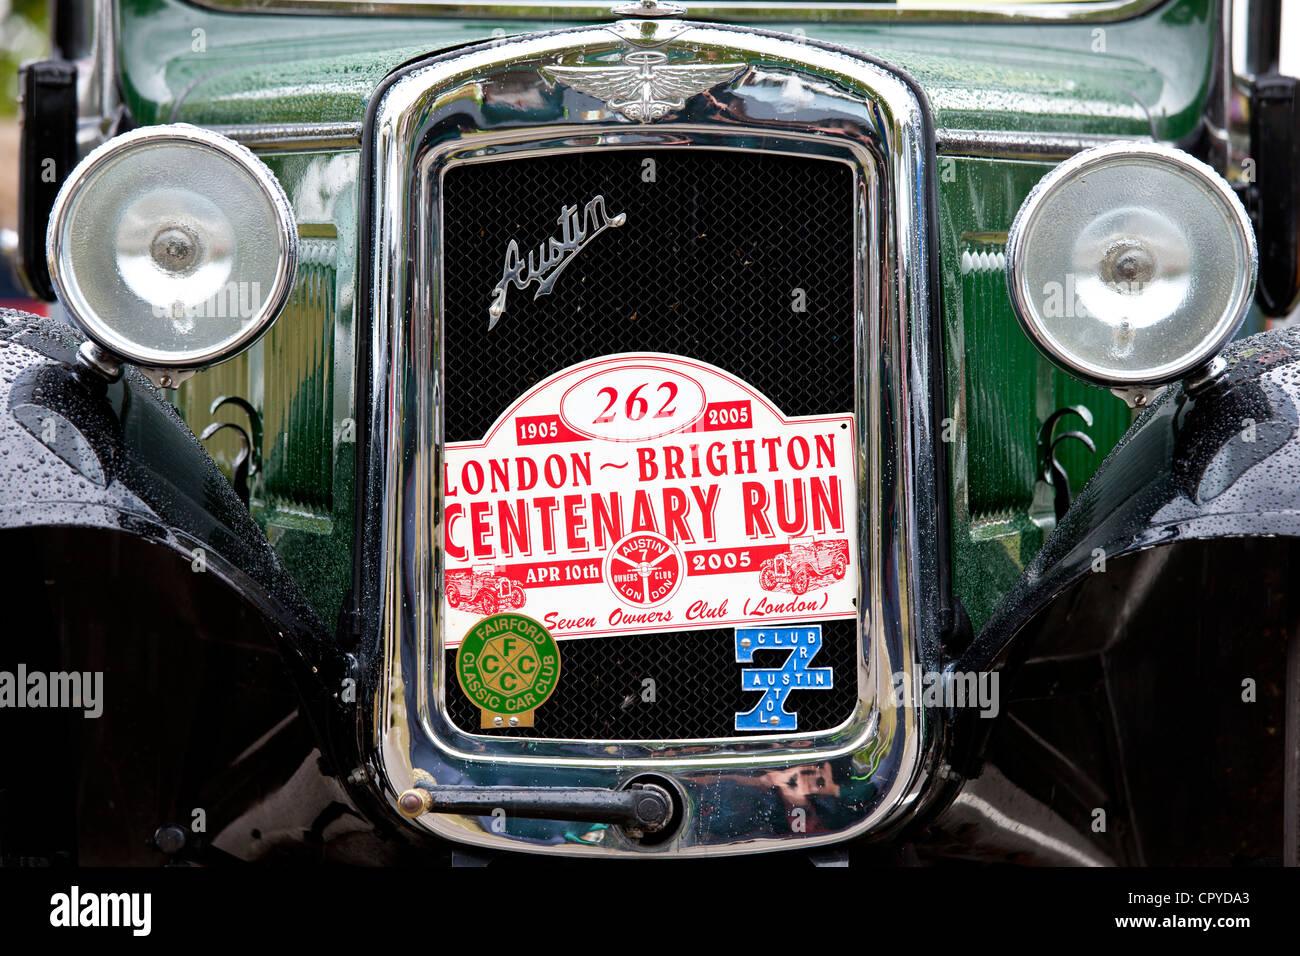 Old Austin Car Stock Photos & Old Austin Car Stock Images - Alamy